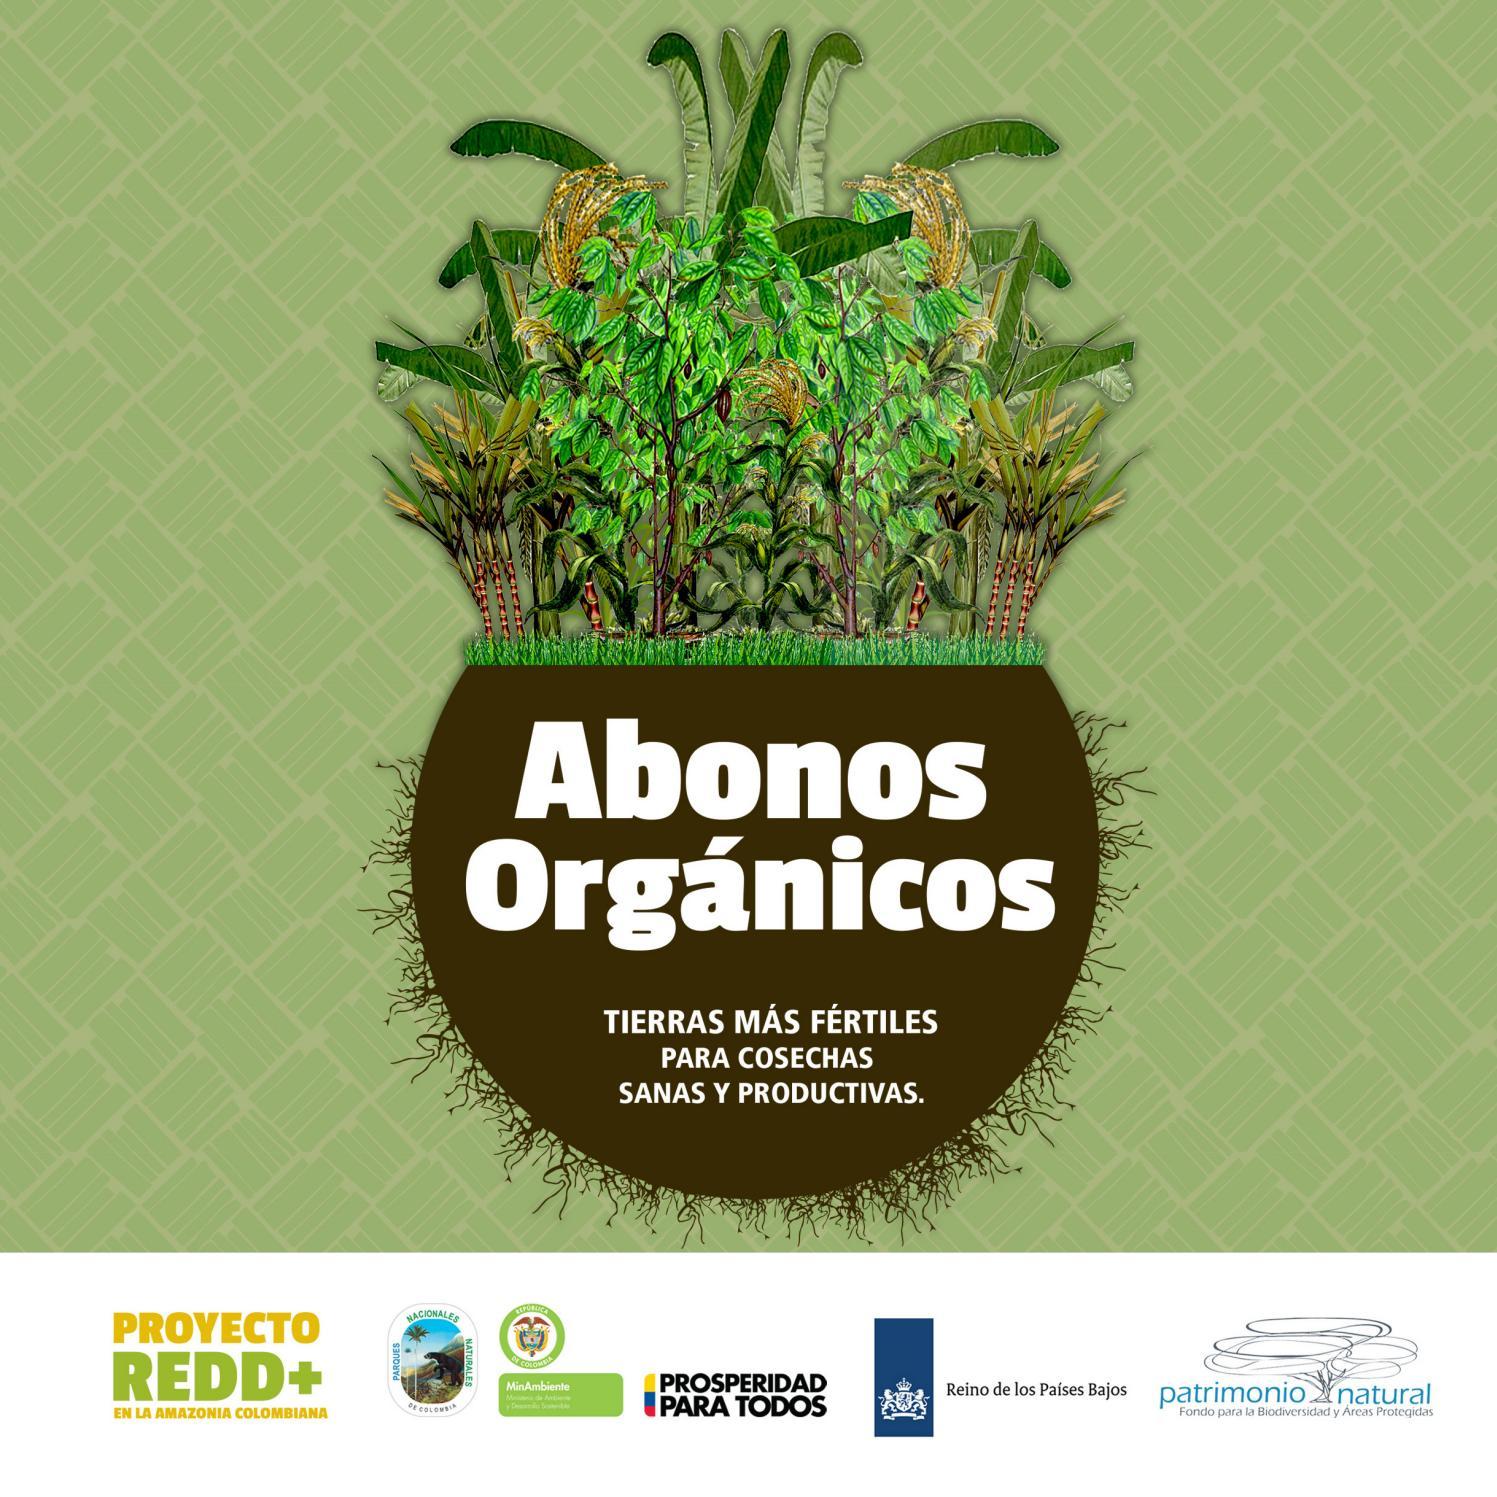 cartilla abonos orgnicos by antipoda_lab issuu - Abono Organico